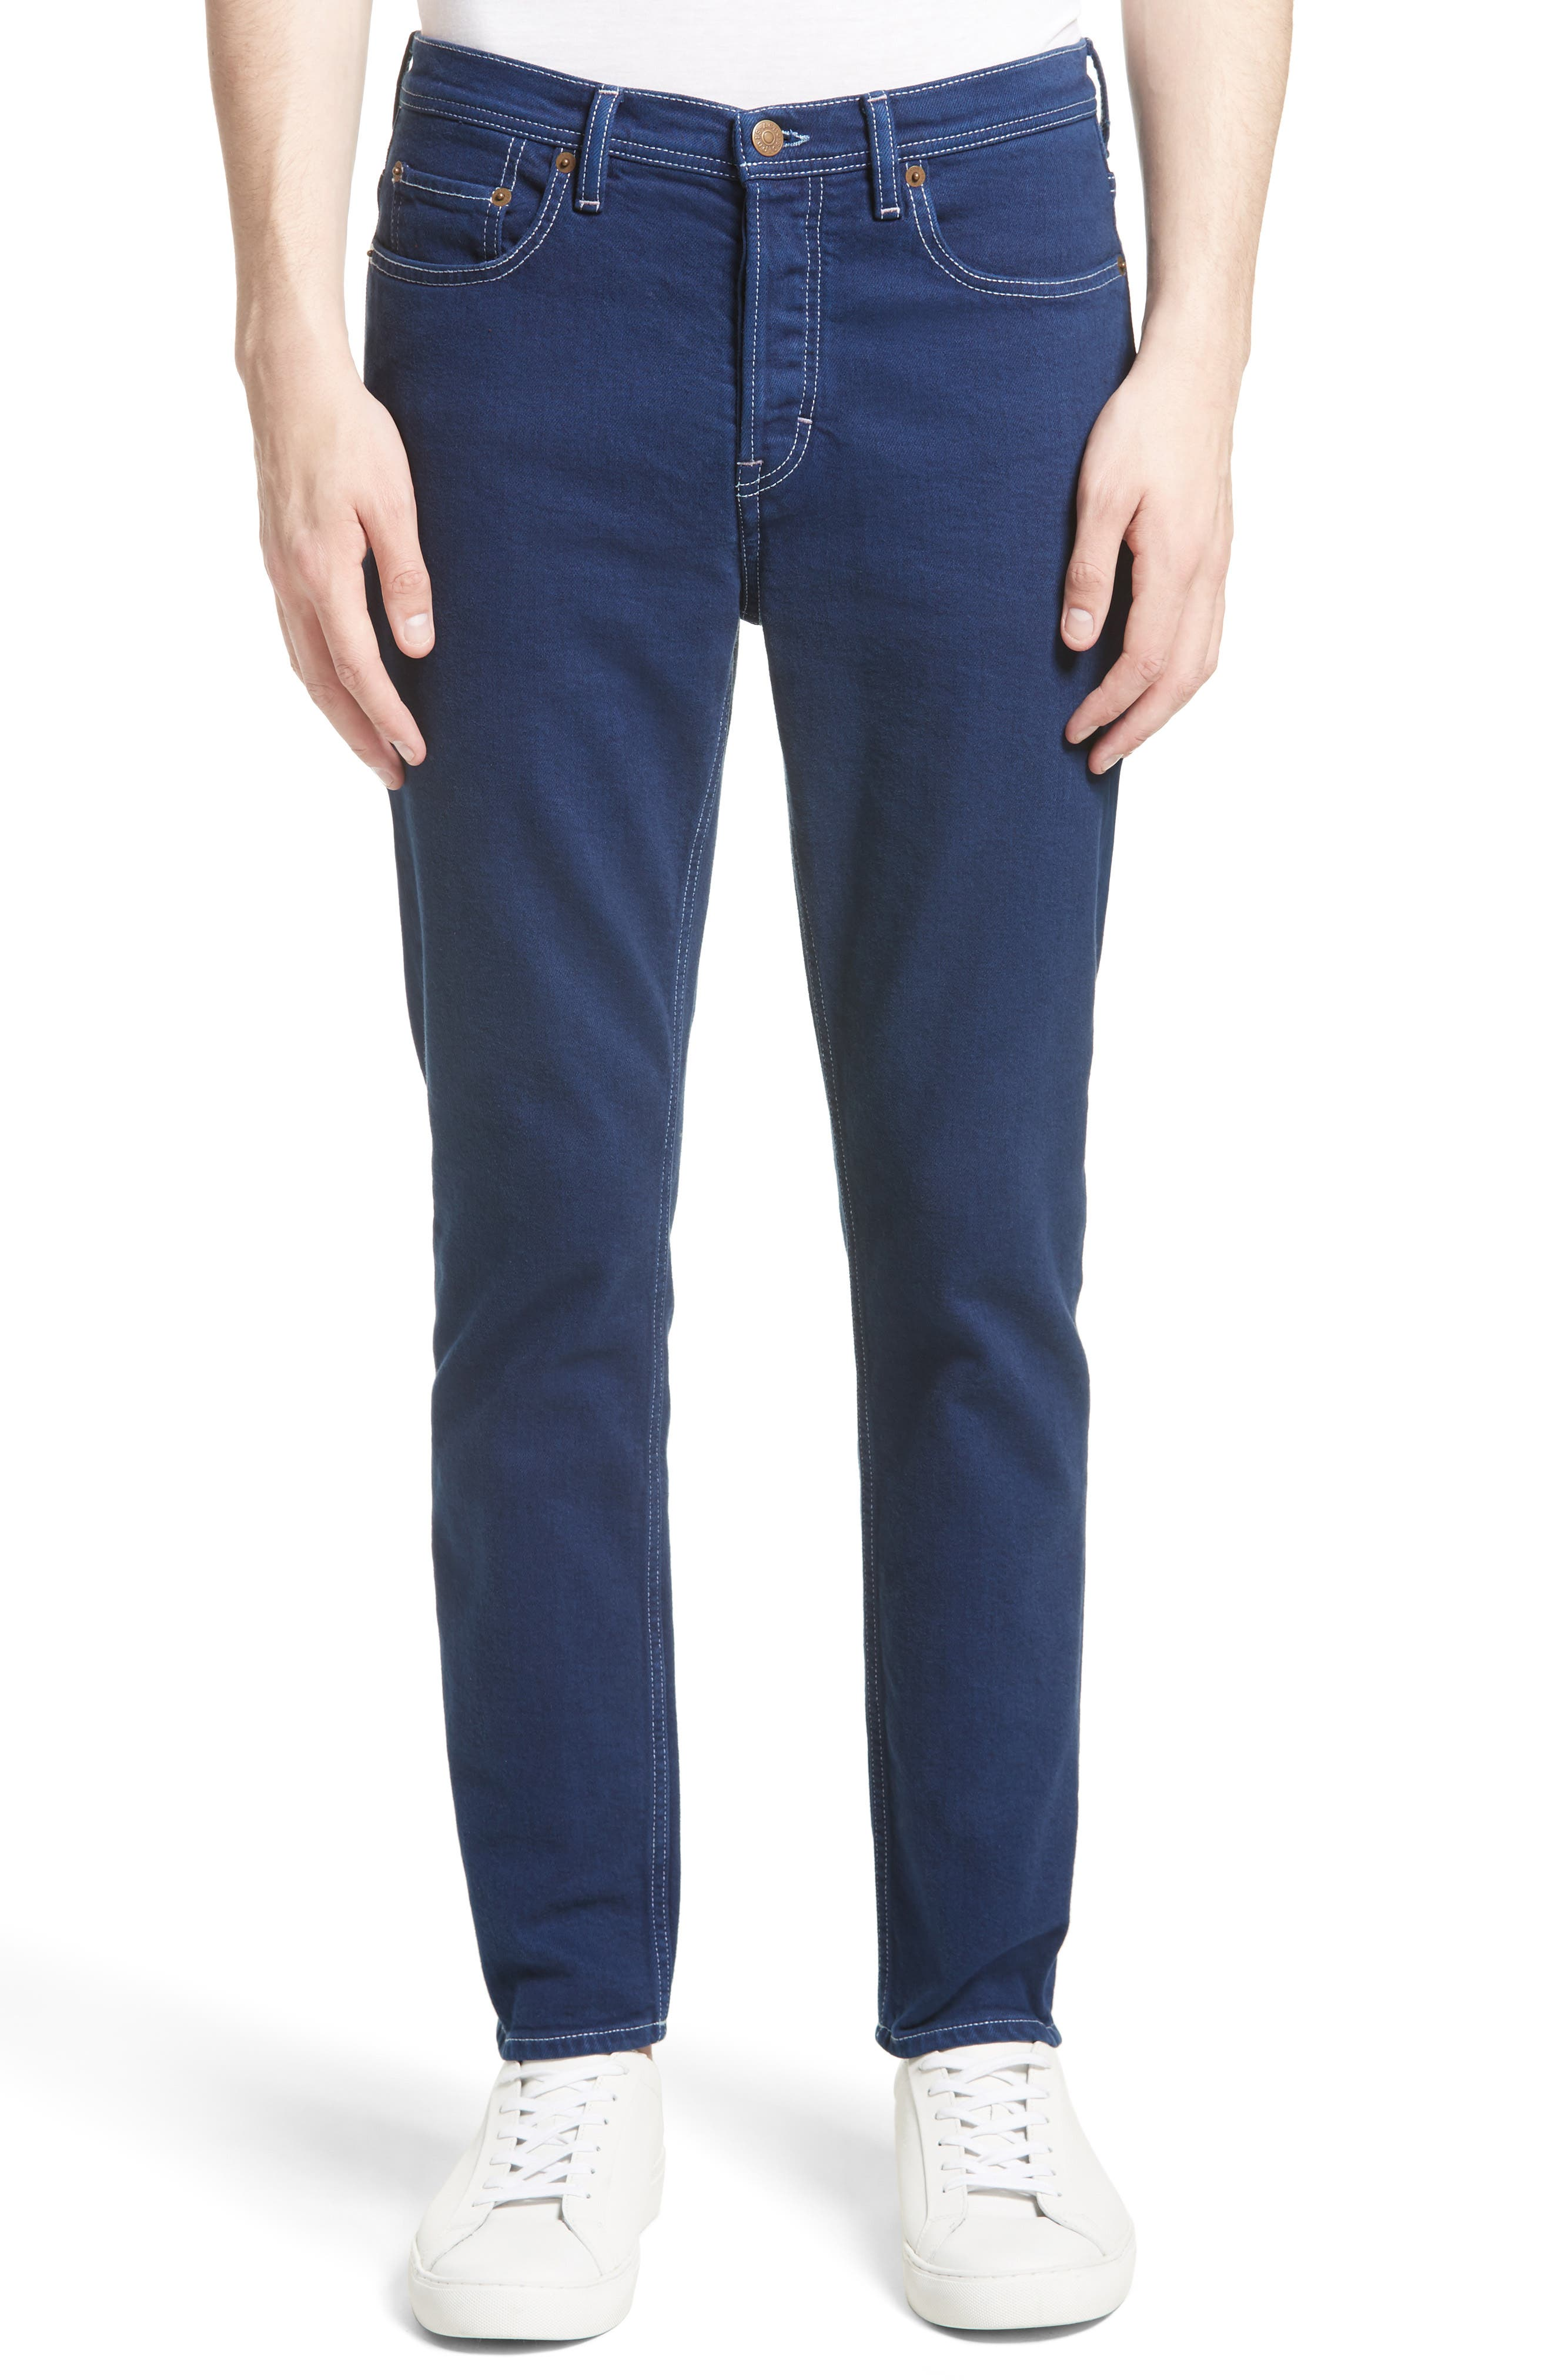 Alternate Image 1 Selected - ACNE Studios River Slim Tapered Fit Jeans (Cobalt)